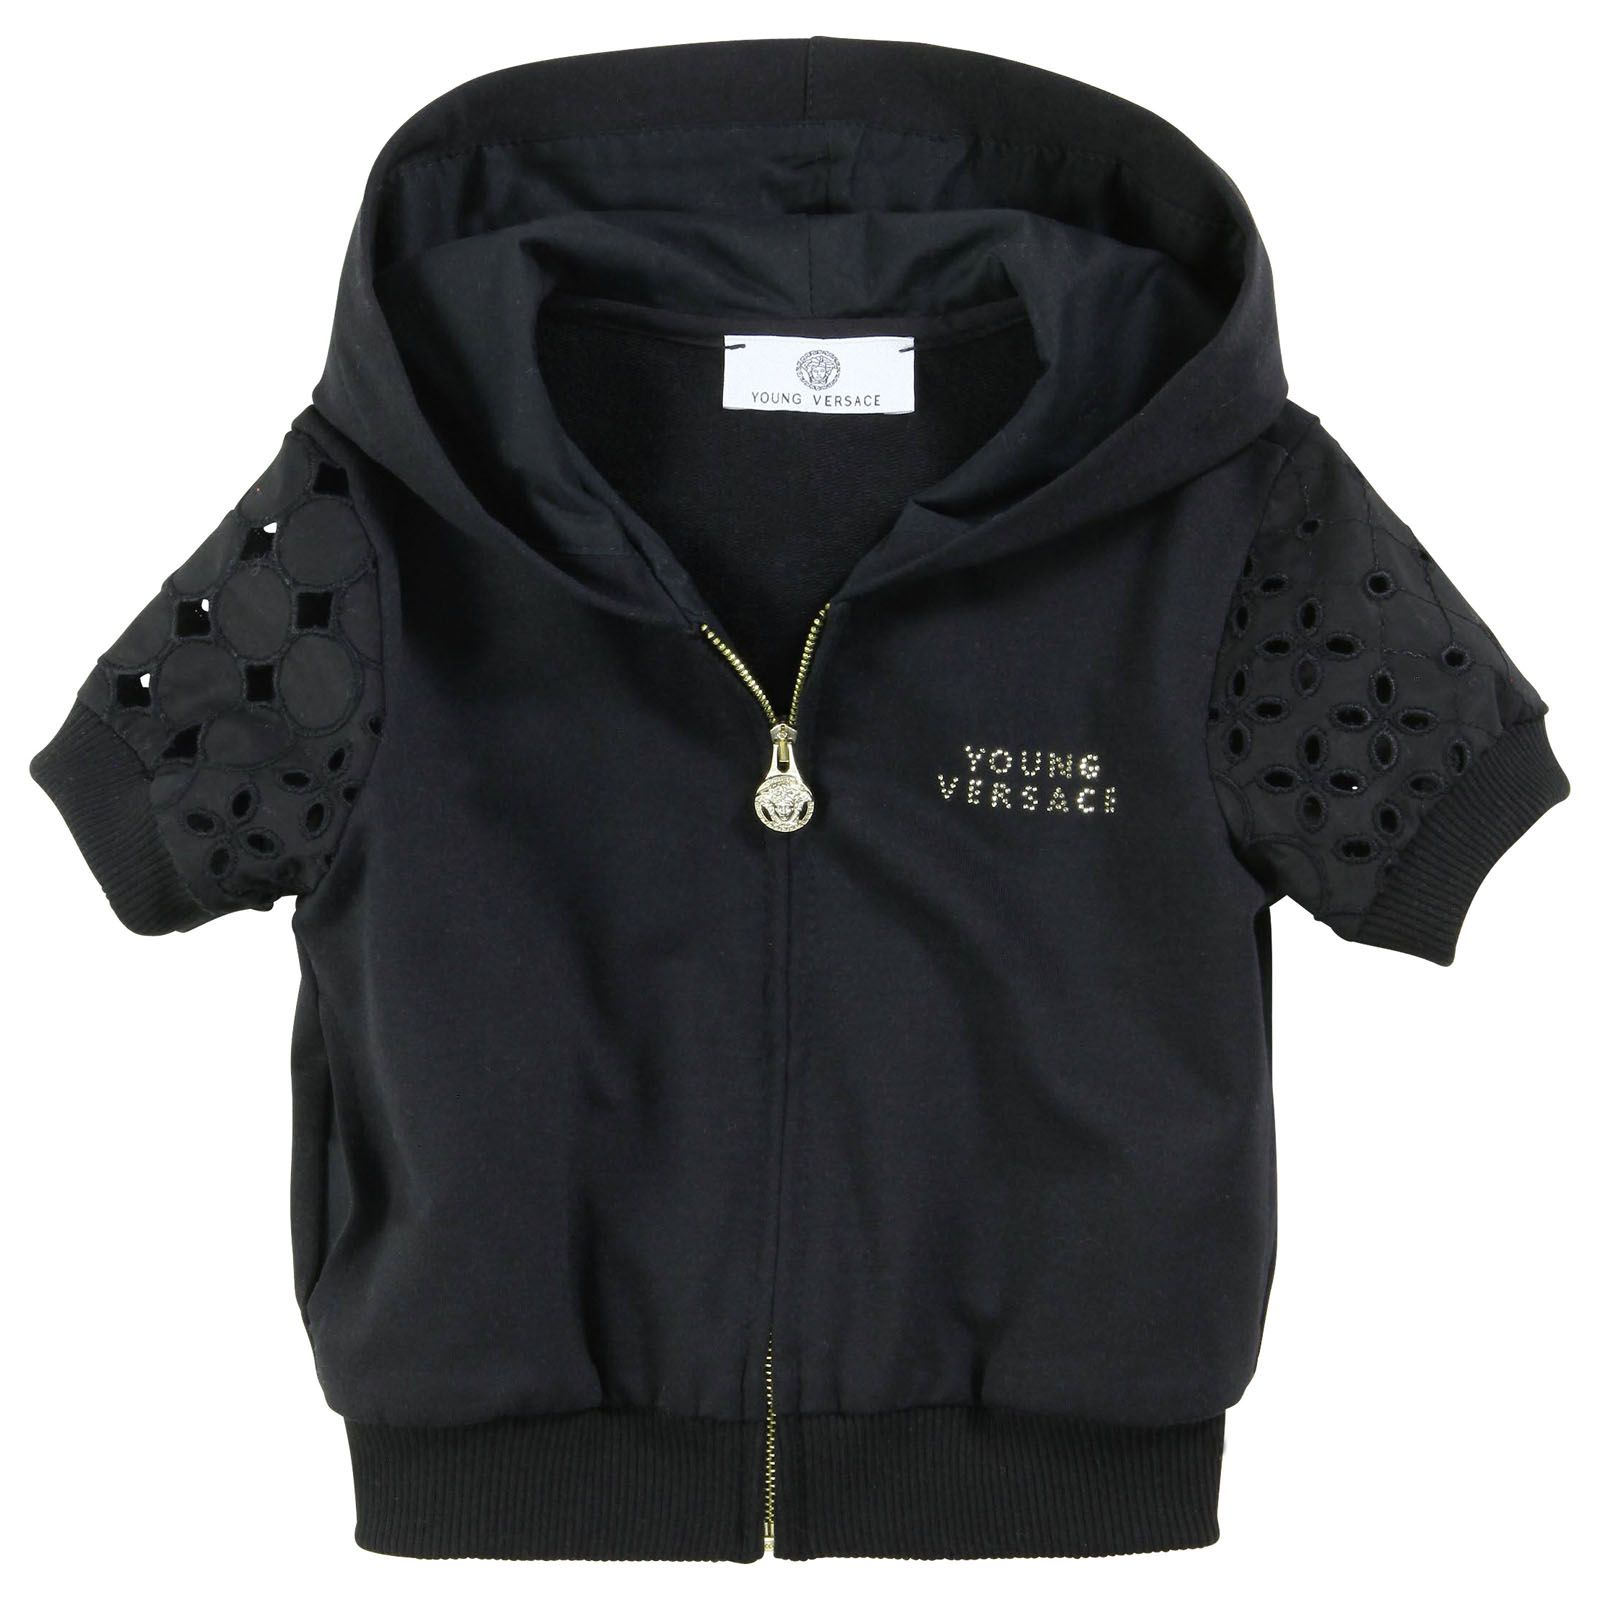 8c26b4ccc583 Baby Versace. -so cute!!